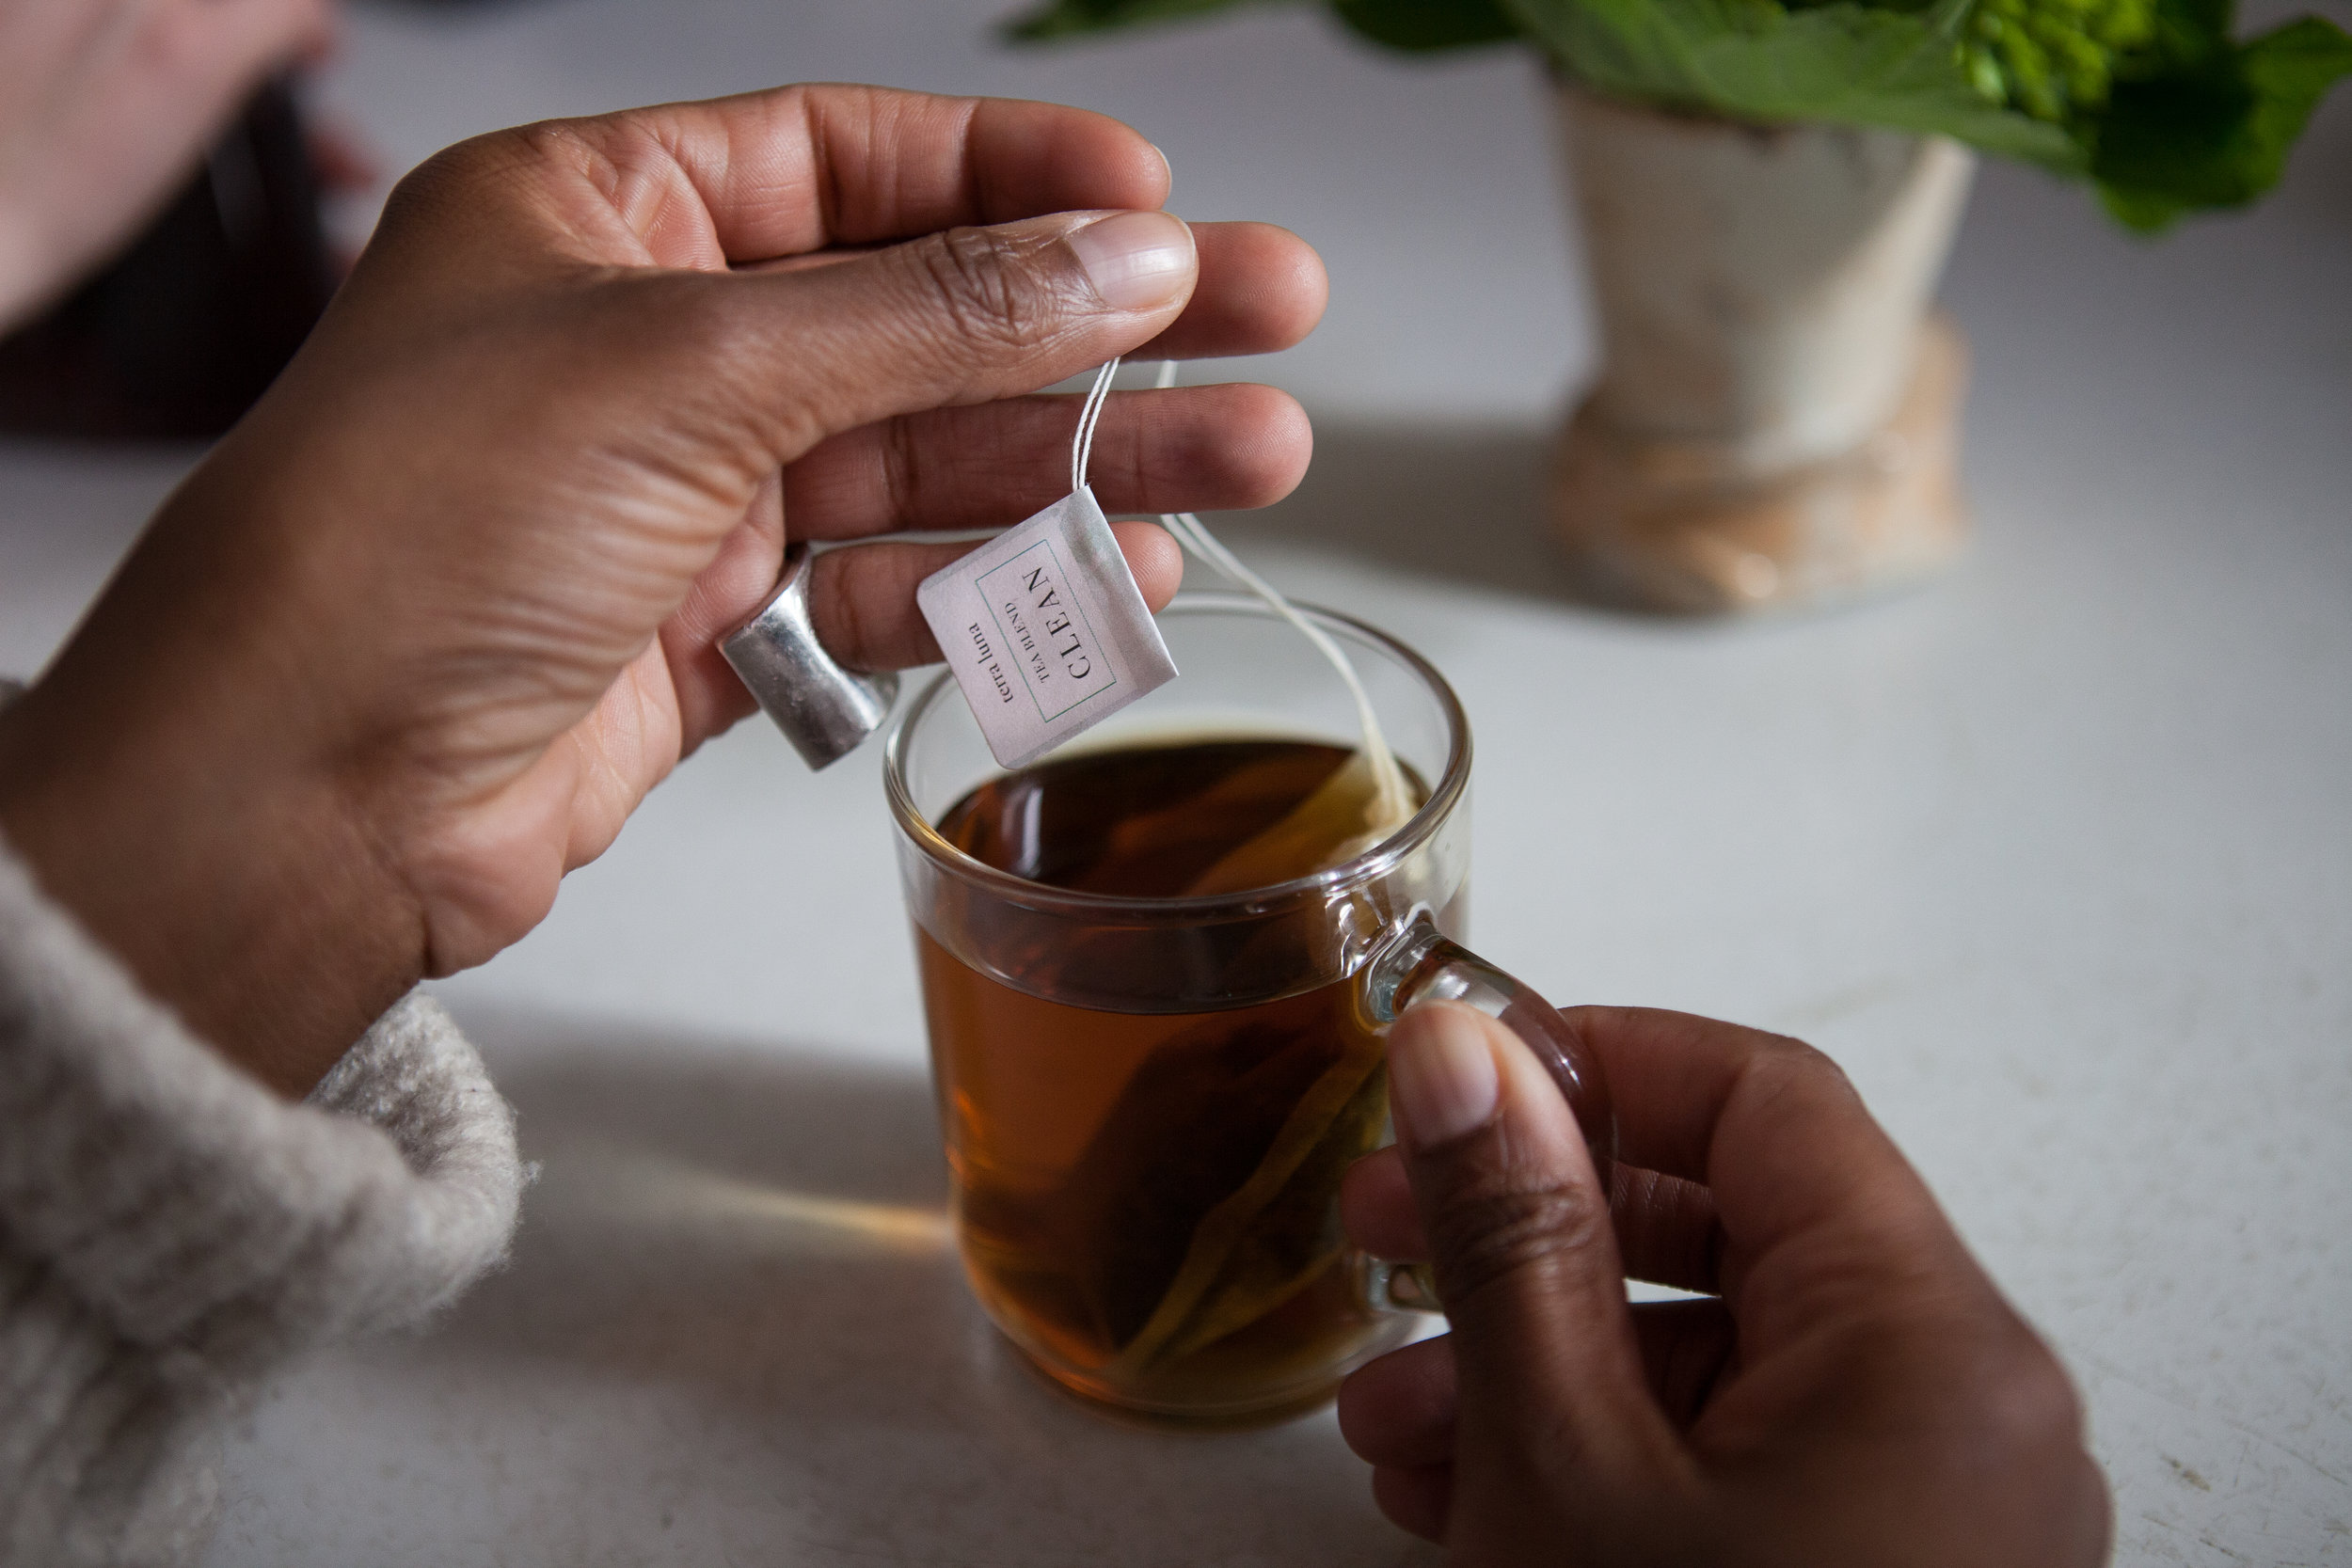 Clean-tea-bag-cup-terra-luna-.jpg